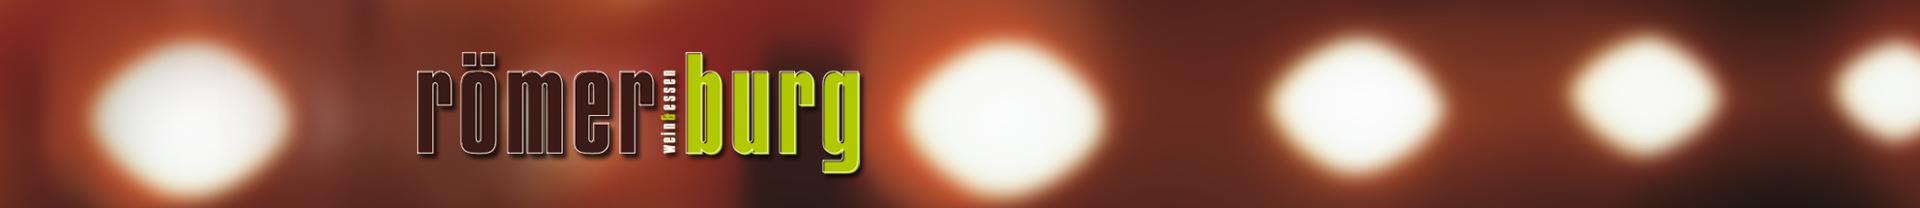 logo-roemerburg-boppard